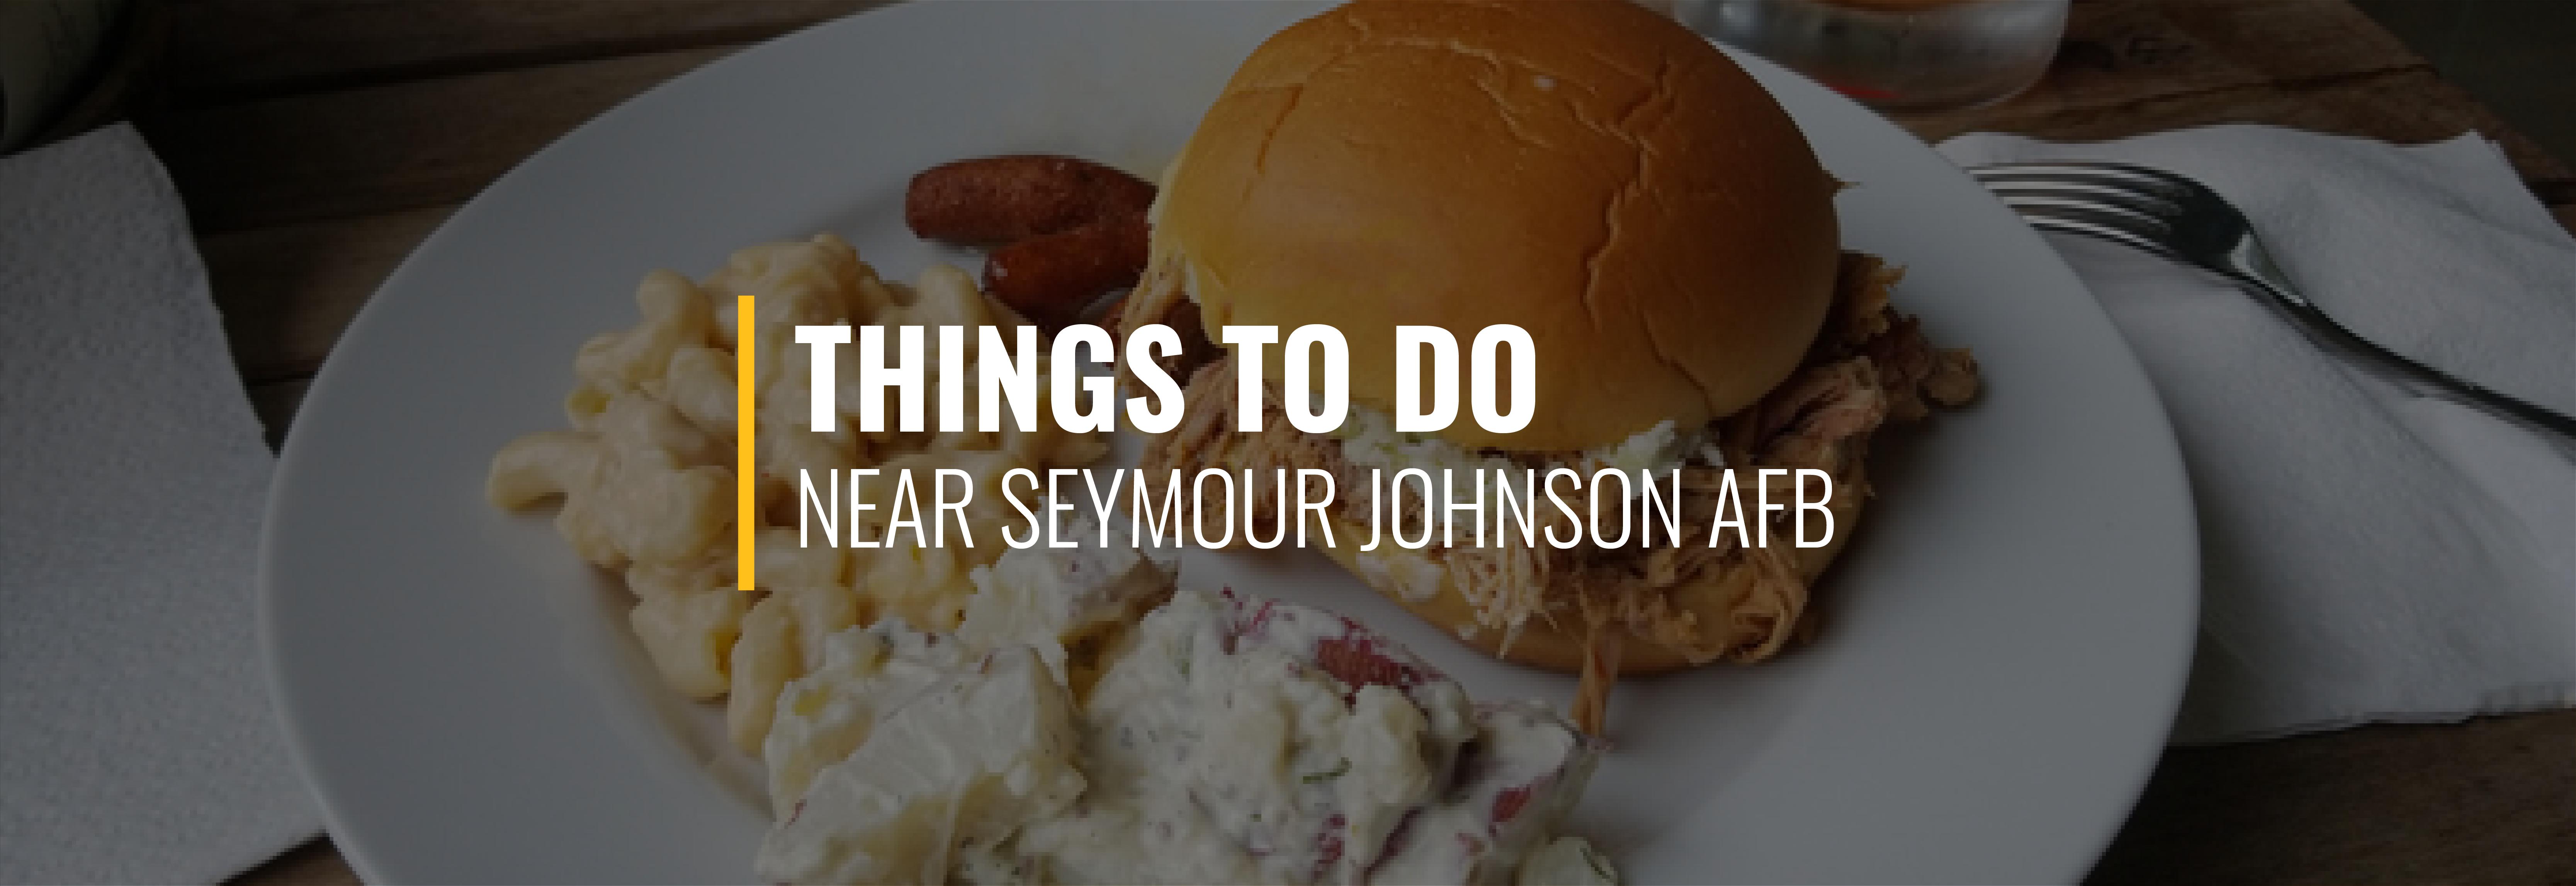 Things to Do Near Seymour Johnson AFB